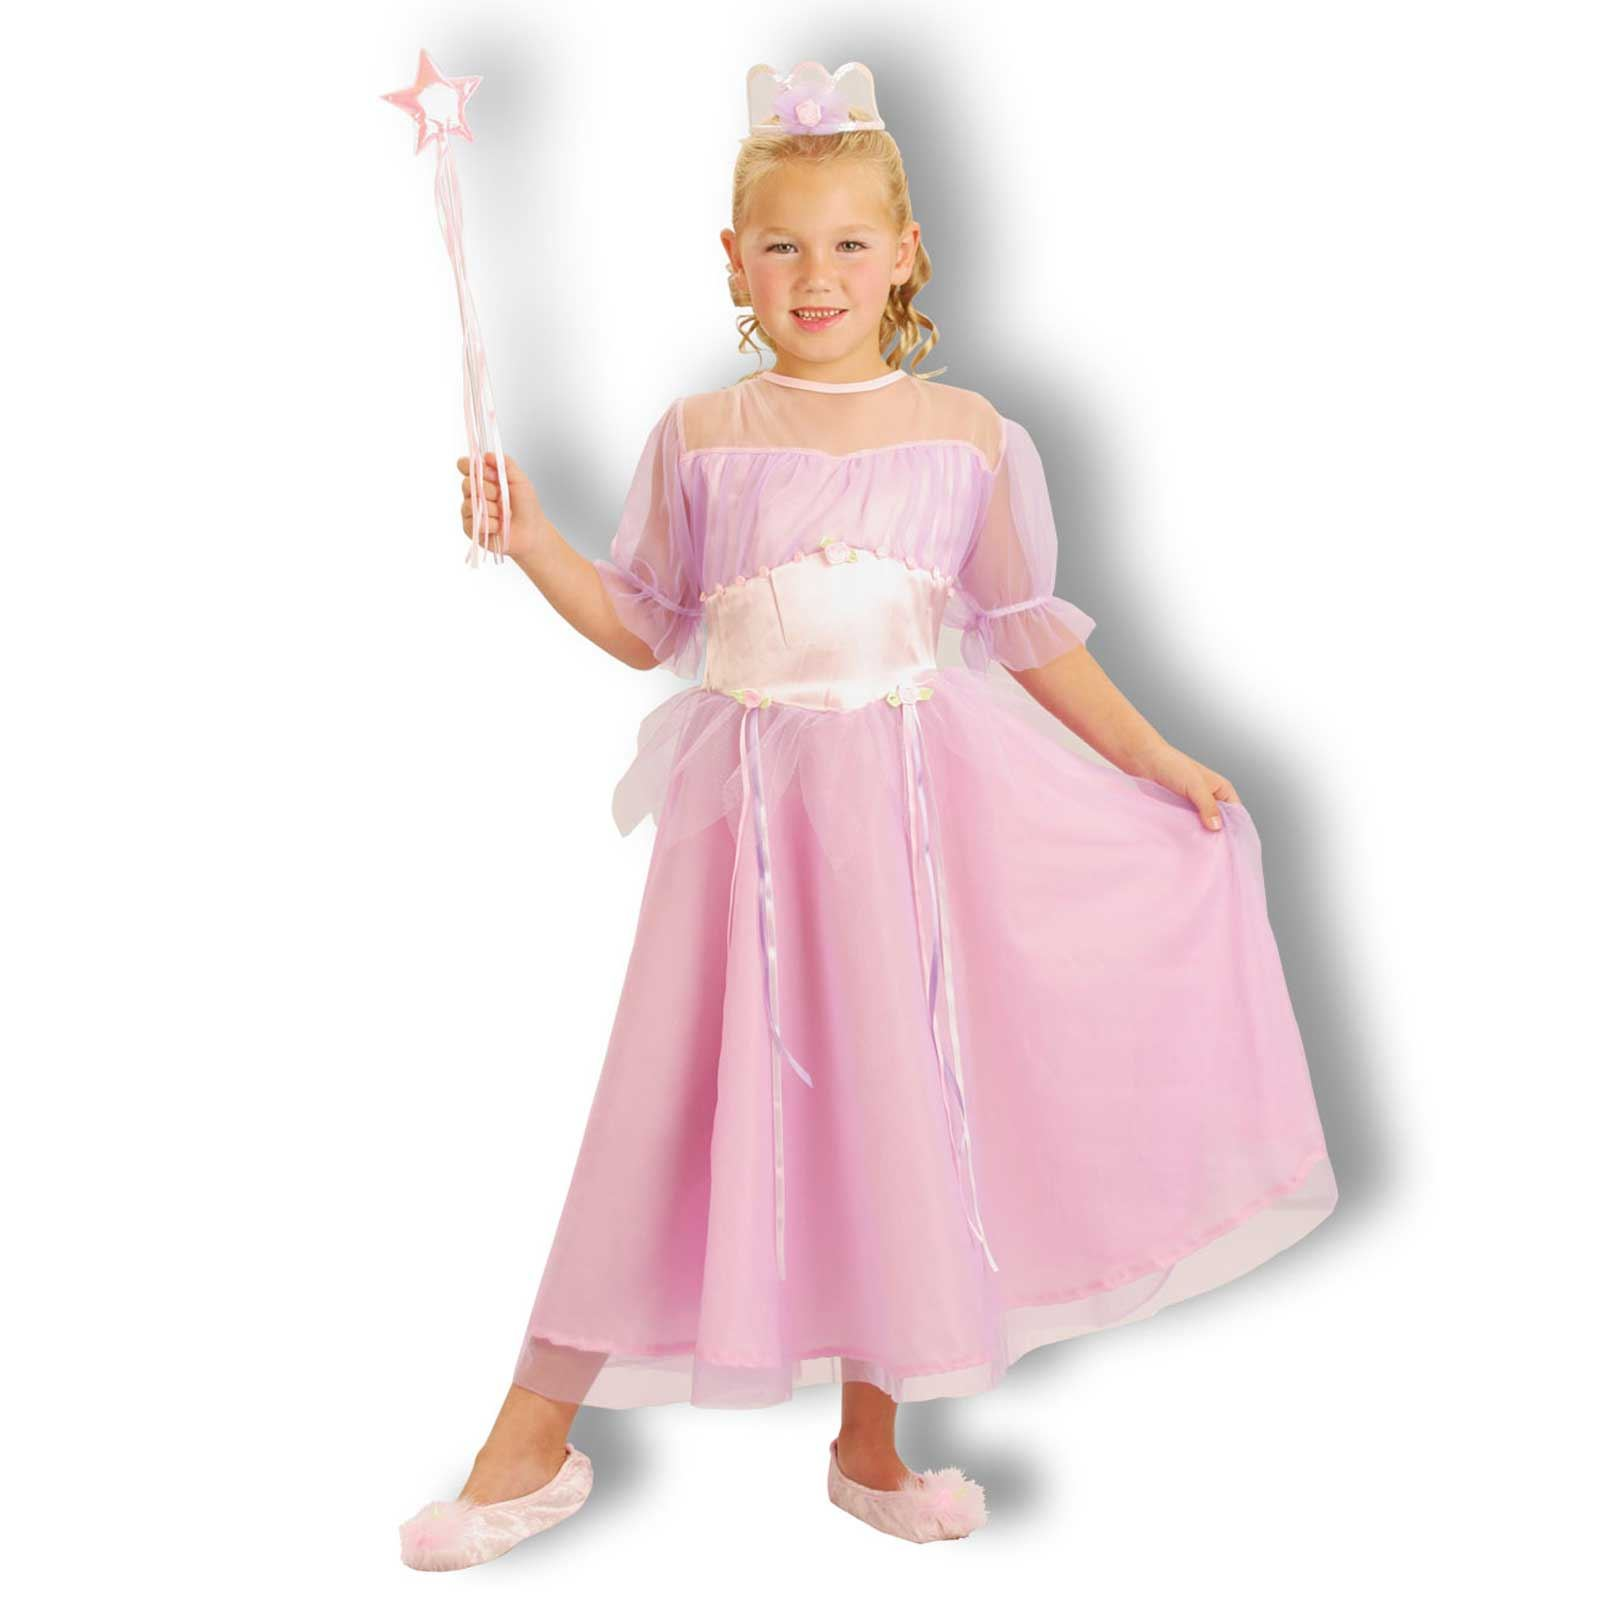 GIRLS DISNEY PRINCESS FANCY COSTUME PARTY DRESS CHILDREN SCHOOL KIDS ...